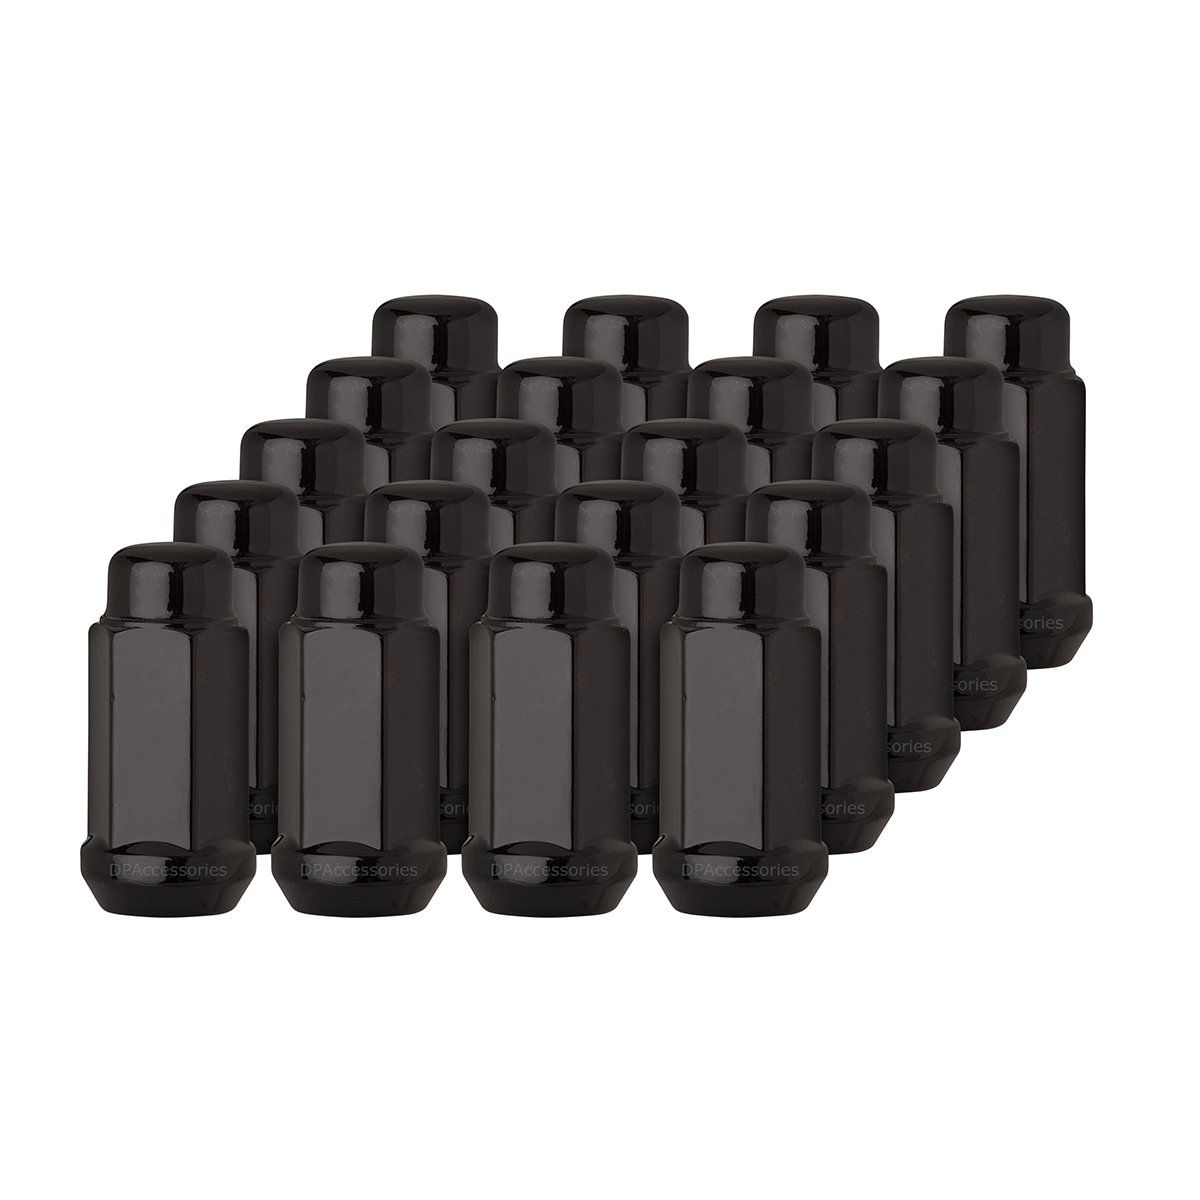 DPAccessories LCB4B8HE2BK04020 20 Black 14x1.5 Closed End XL Bulge Acorn Lug Nuts - Cone Seat - 19mm Hex Wheel Lug Nut